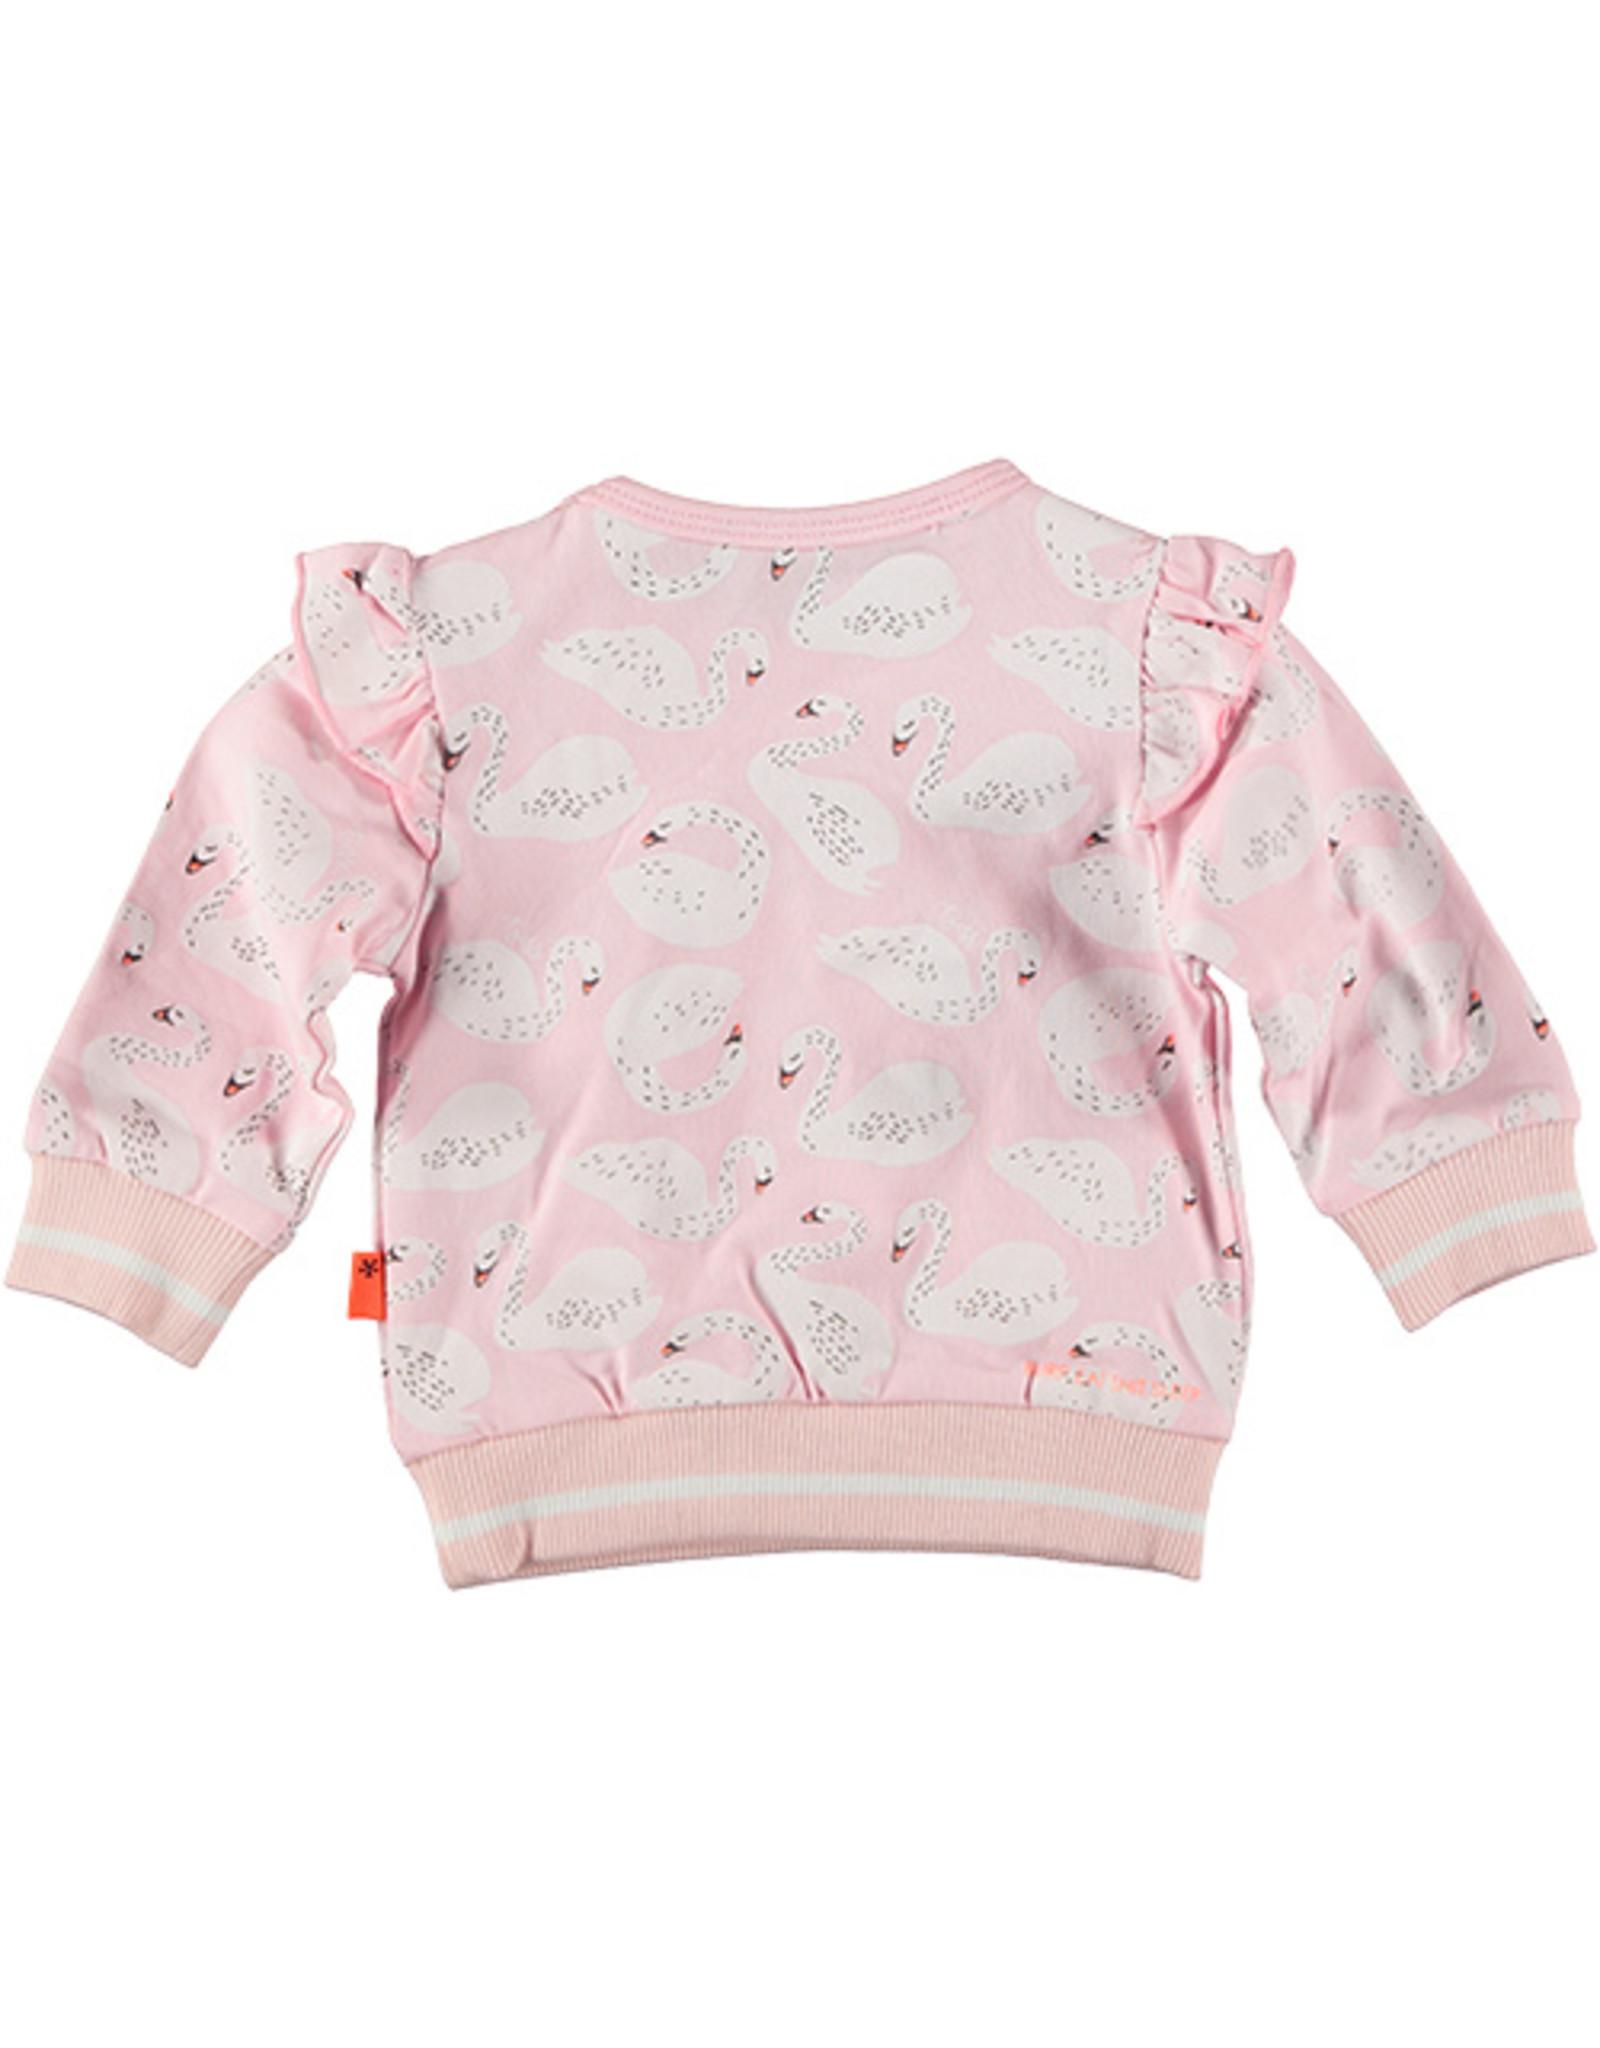 B.E.S.S. Sweater Ruffle Swan, Pink